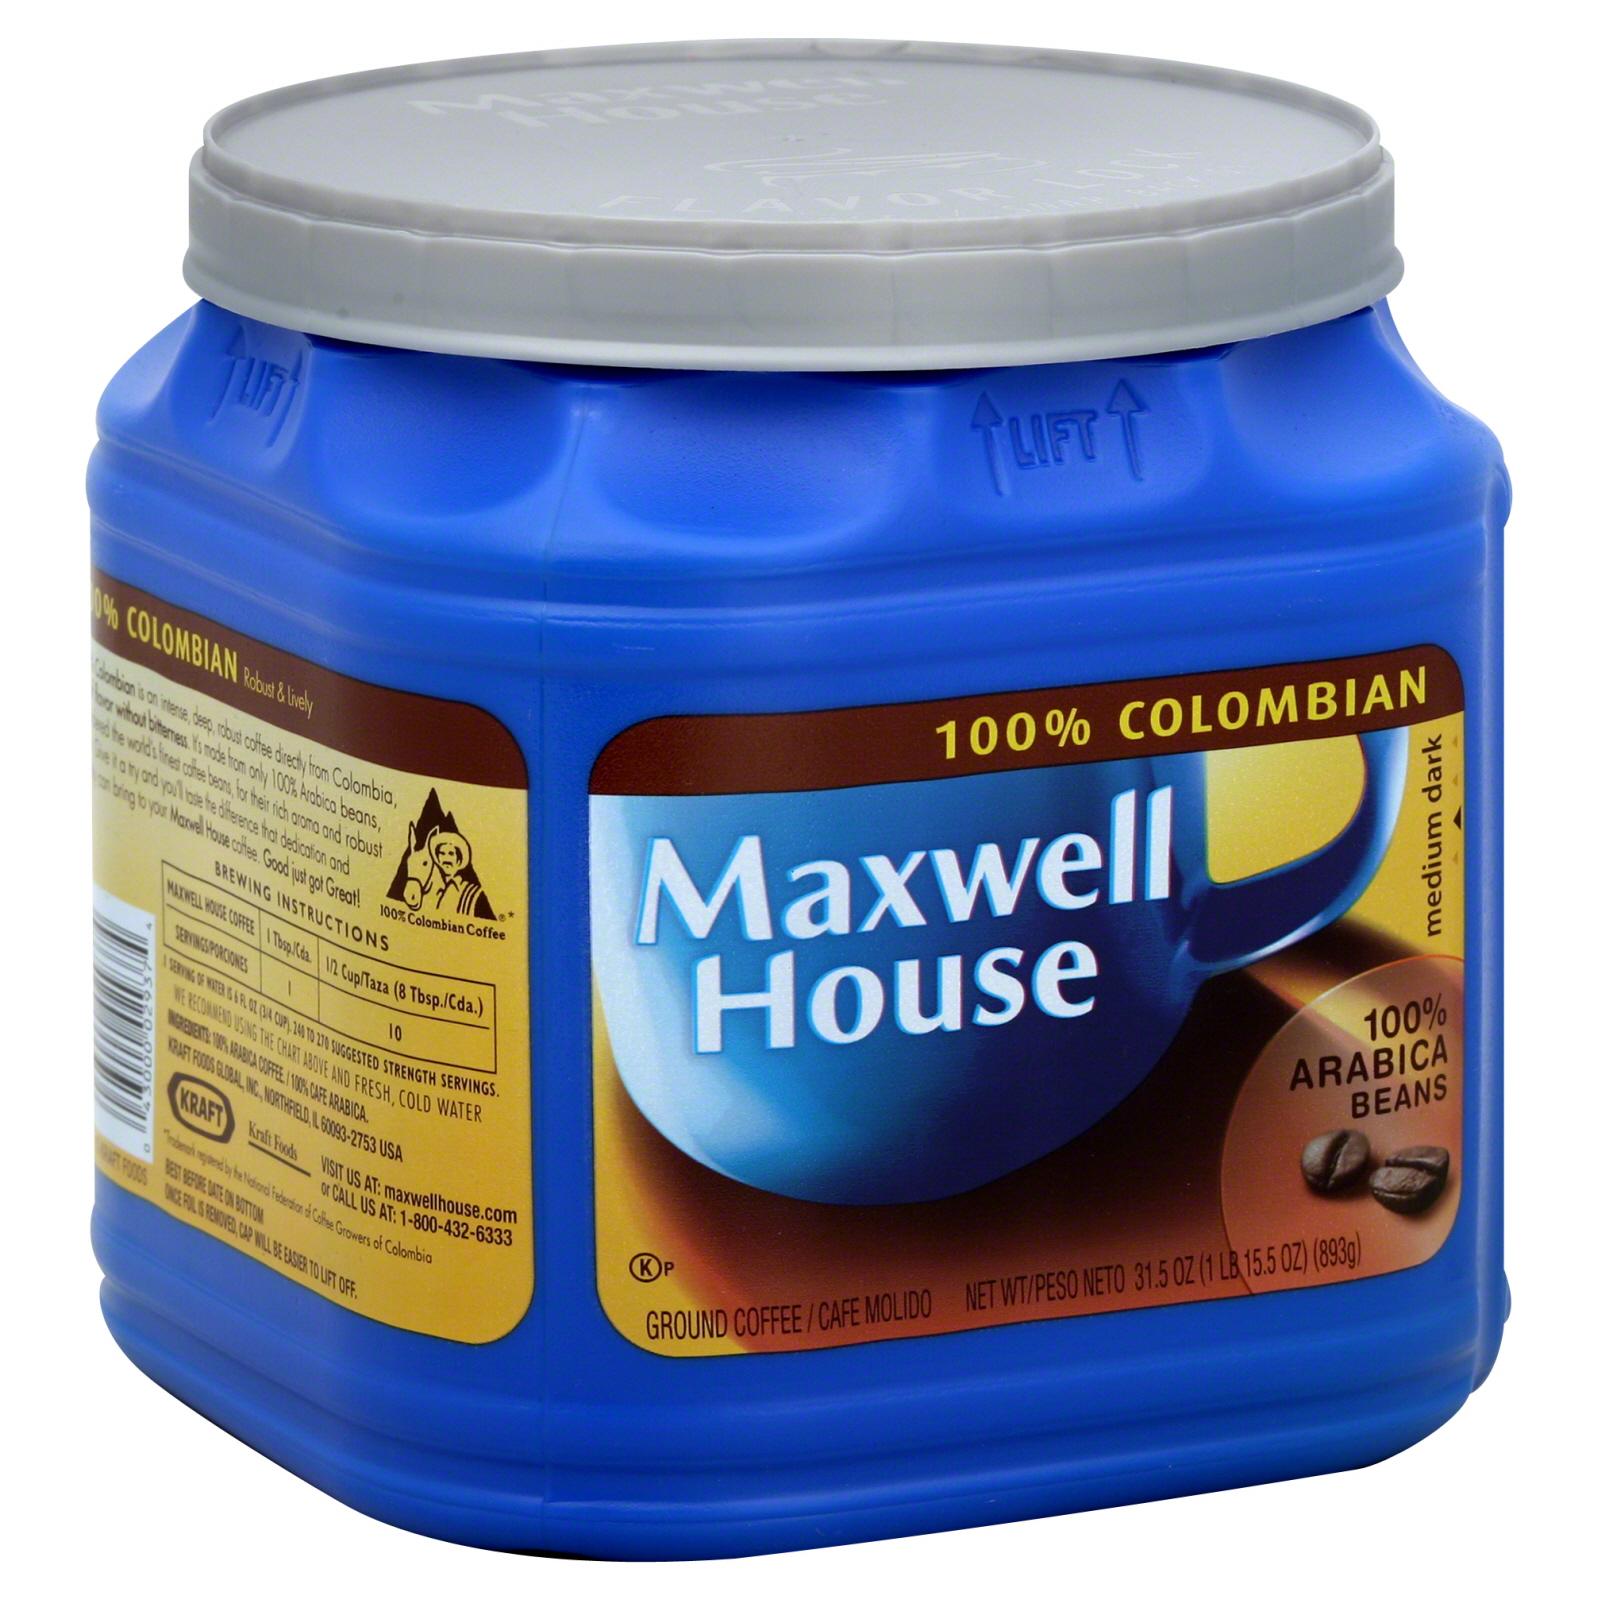 Maxwell House Coffee, Ground, 100% Colombian, Medium Dark, 31.5 oz (1 lb 15.5 oz) 893 g PartNumber: 033W044643811812P KsnValue: 44643811 MfgPartNumber: 75104